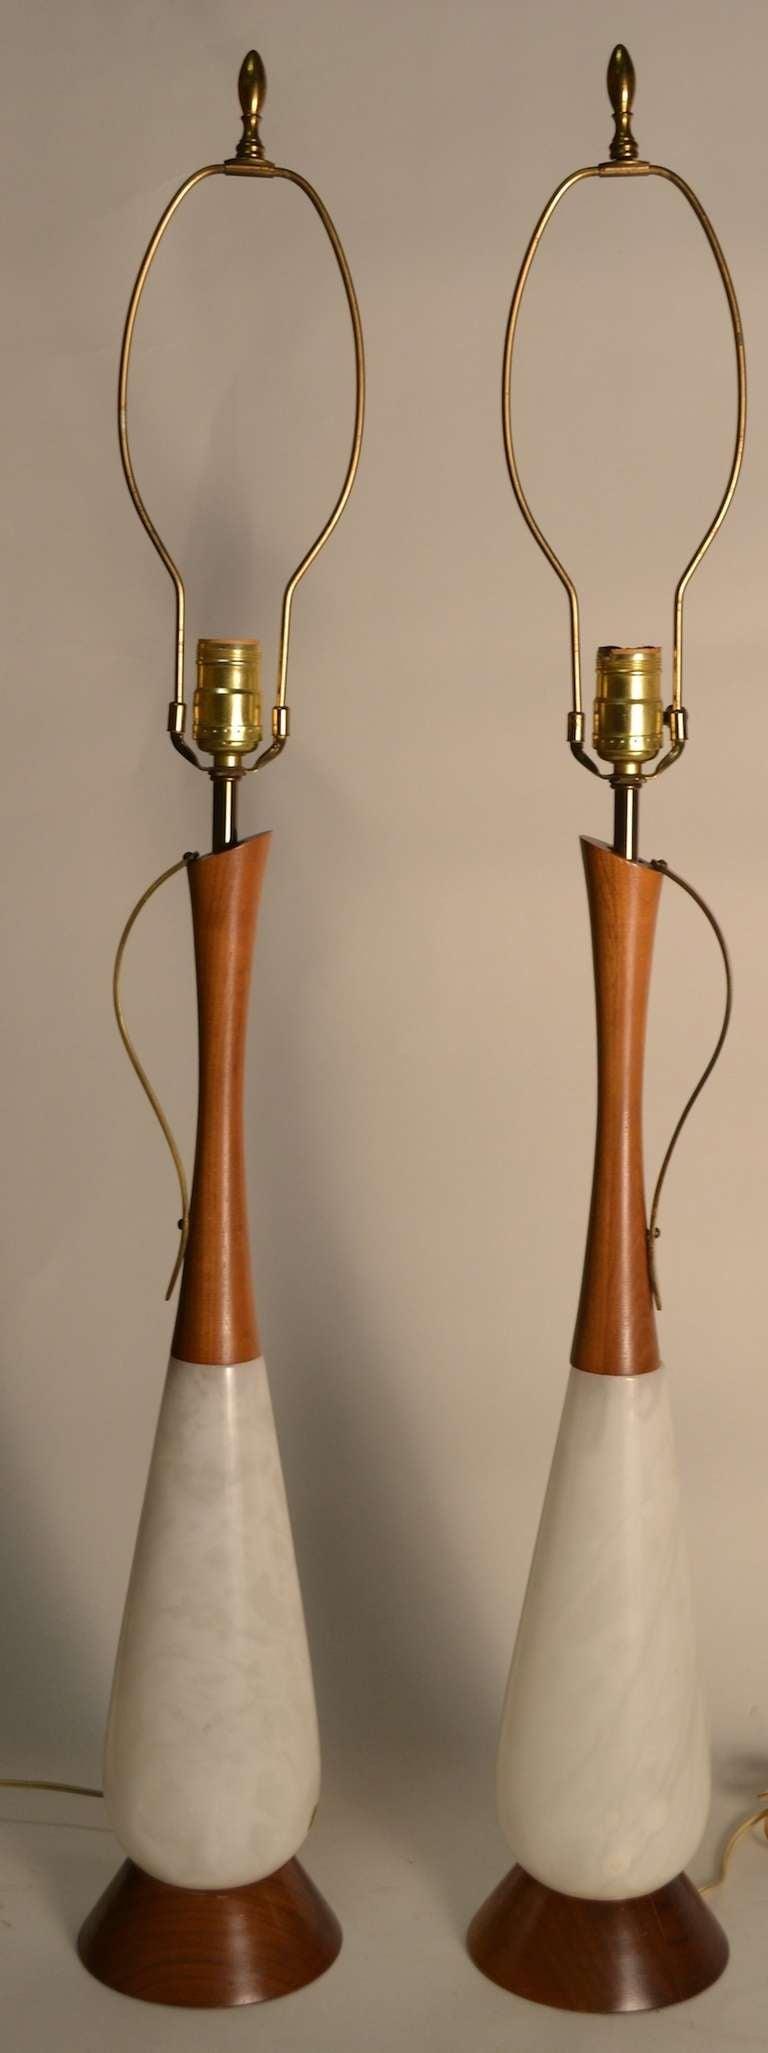 pair teak and alabaster mid century modern lamps made in italy at  - pair teak and alabaster mid century modern lamps made in italy